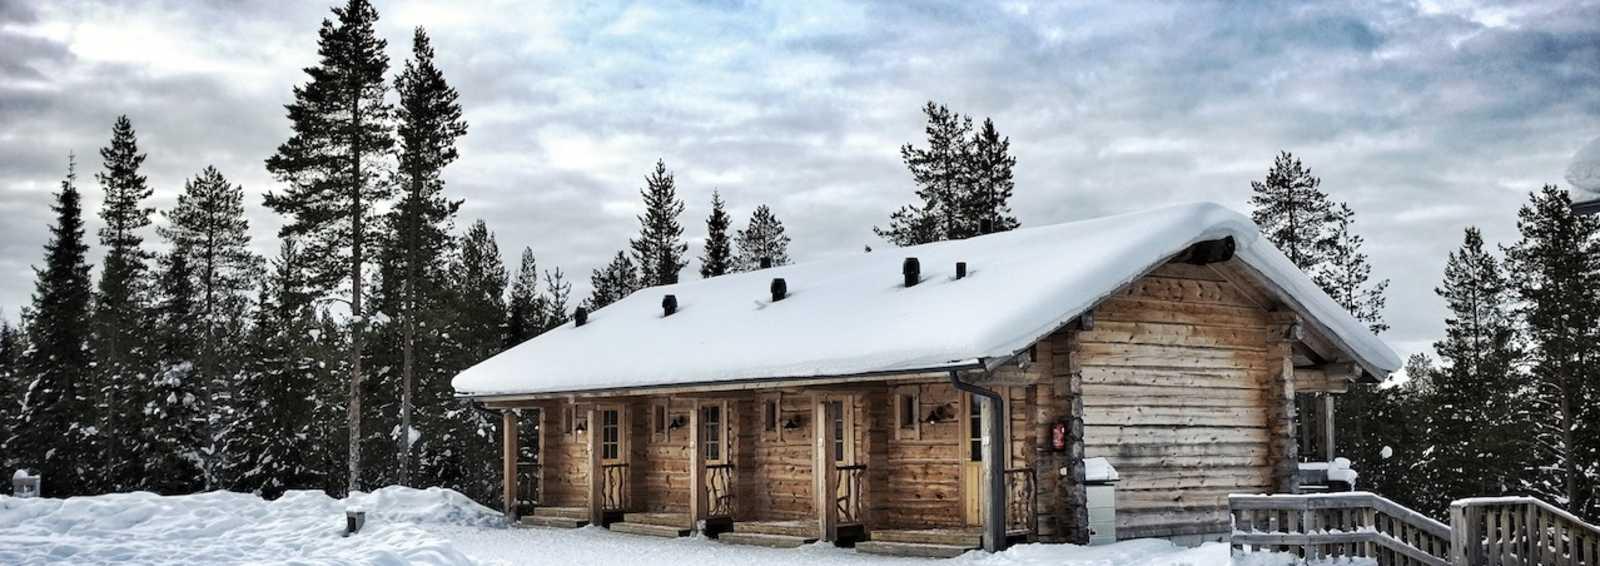 Basecamp Oulanka's log cabins